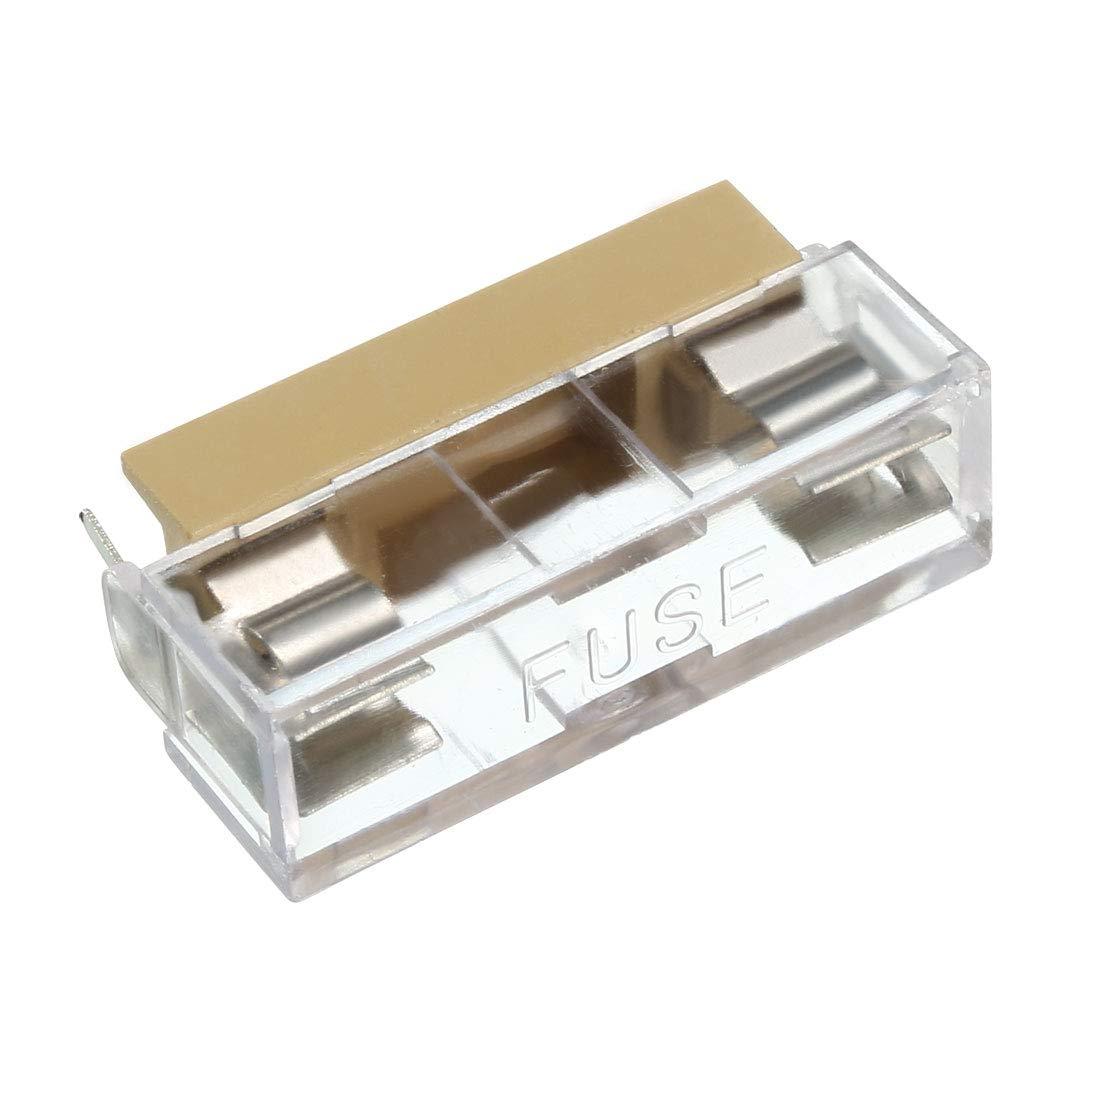 1-Gang, TayMac SB475Z Weatherproof Box Bronze 3//4-Inch Outlets 4